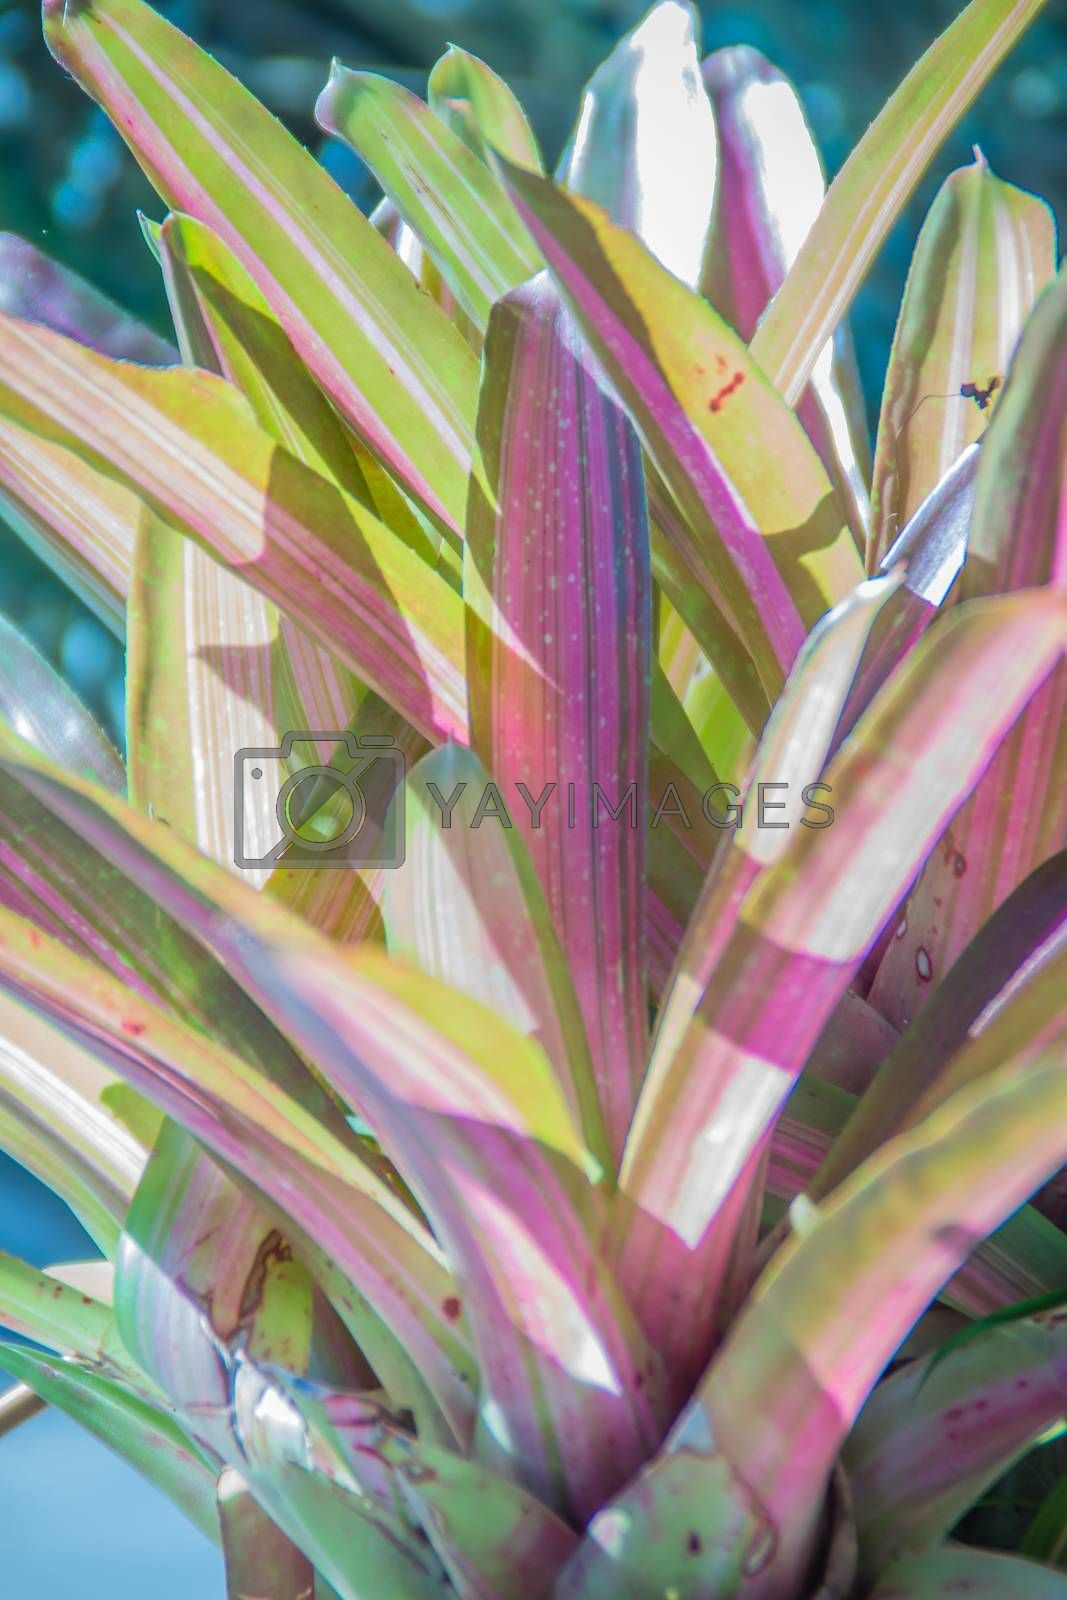 Pink hybrid aechmea fasciata or bromeliad pineapple with sunshine in the morning.